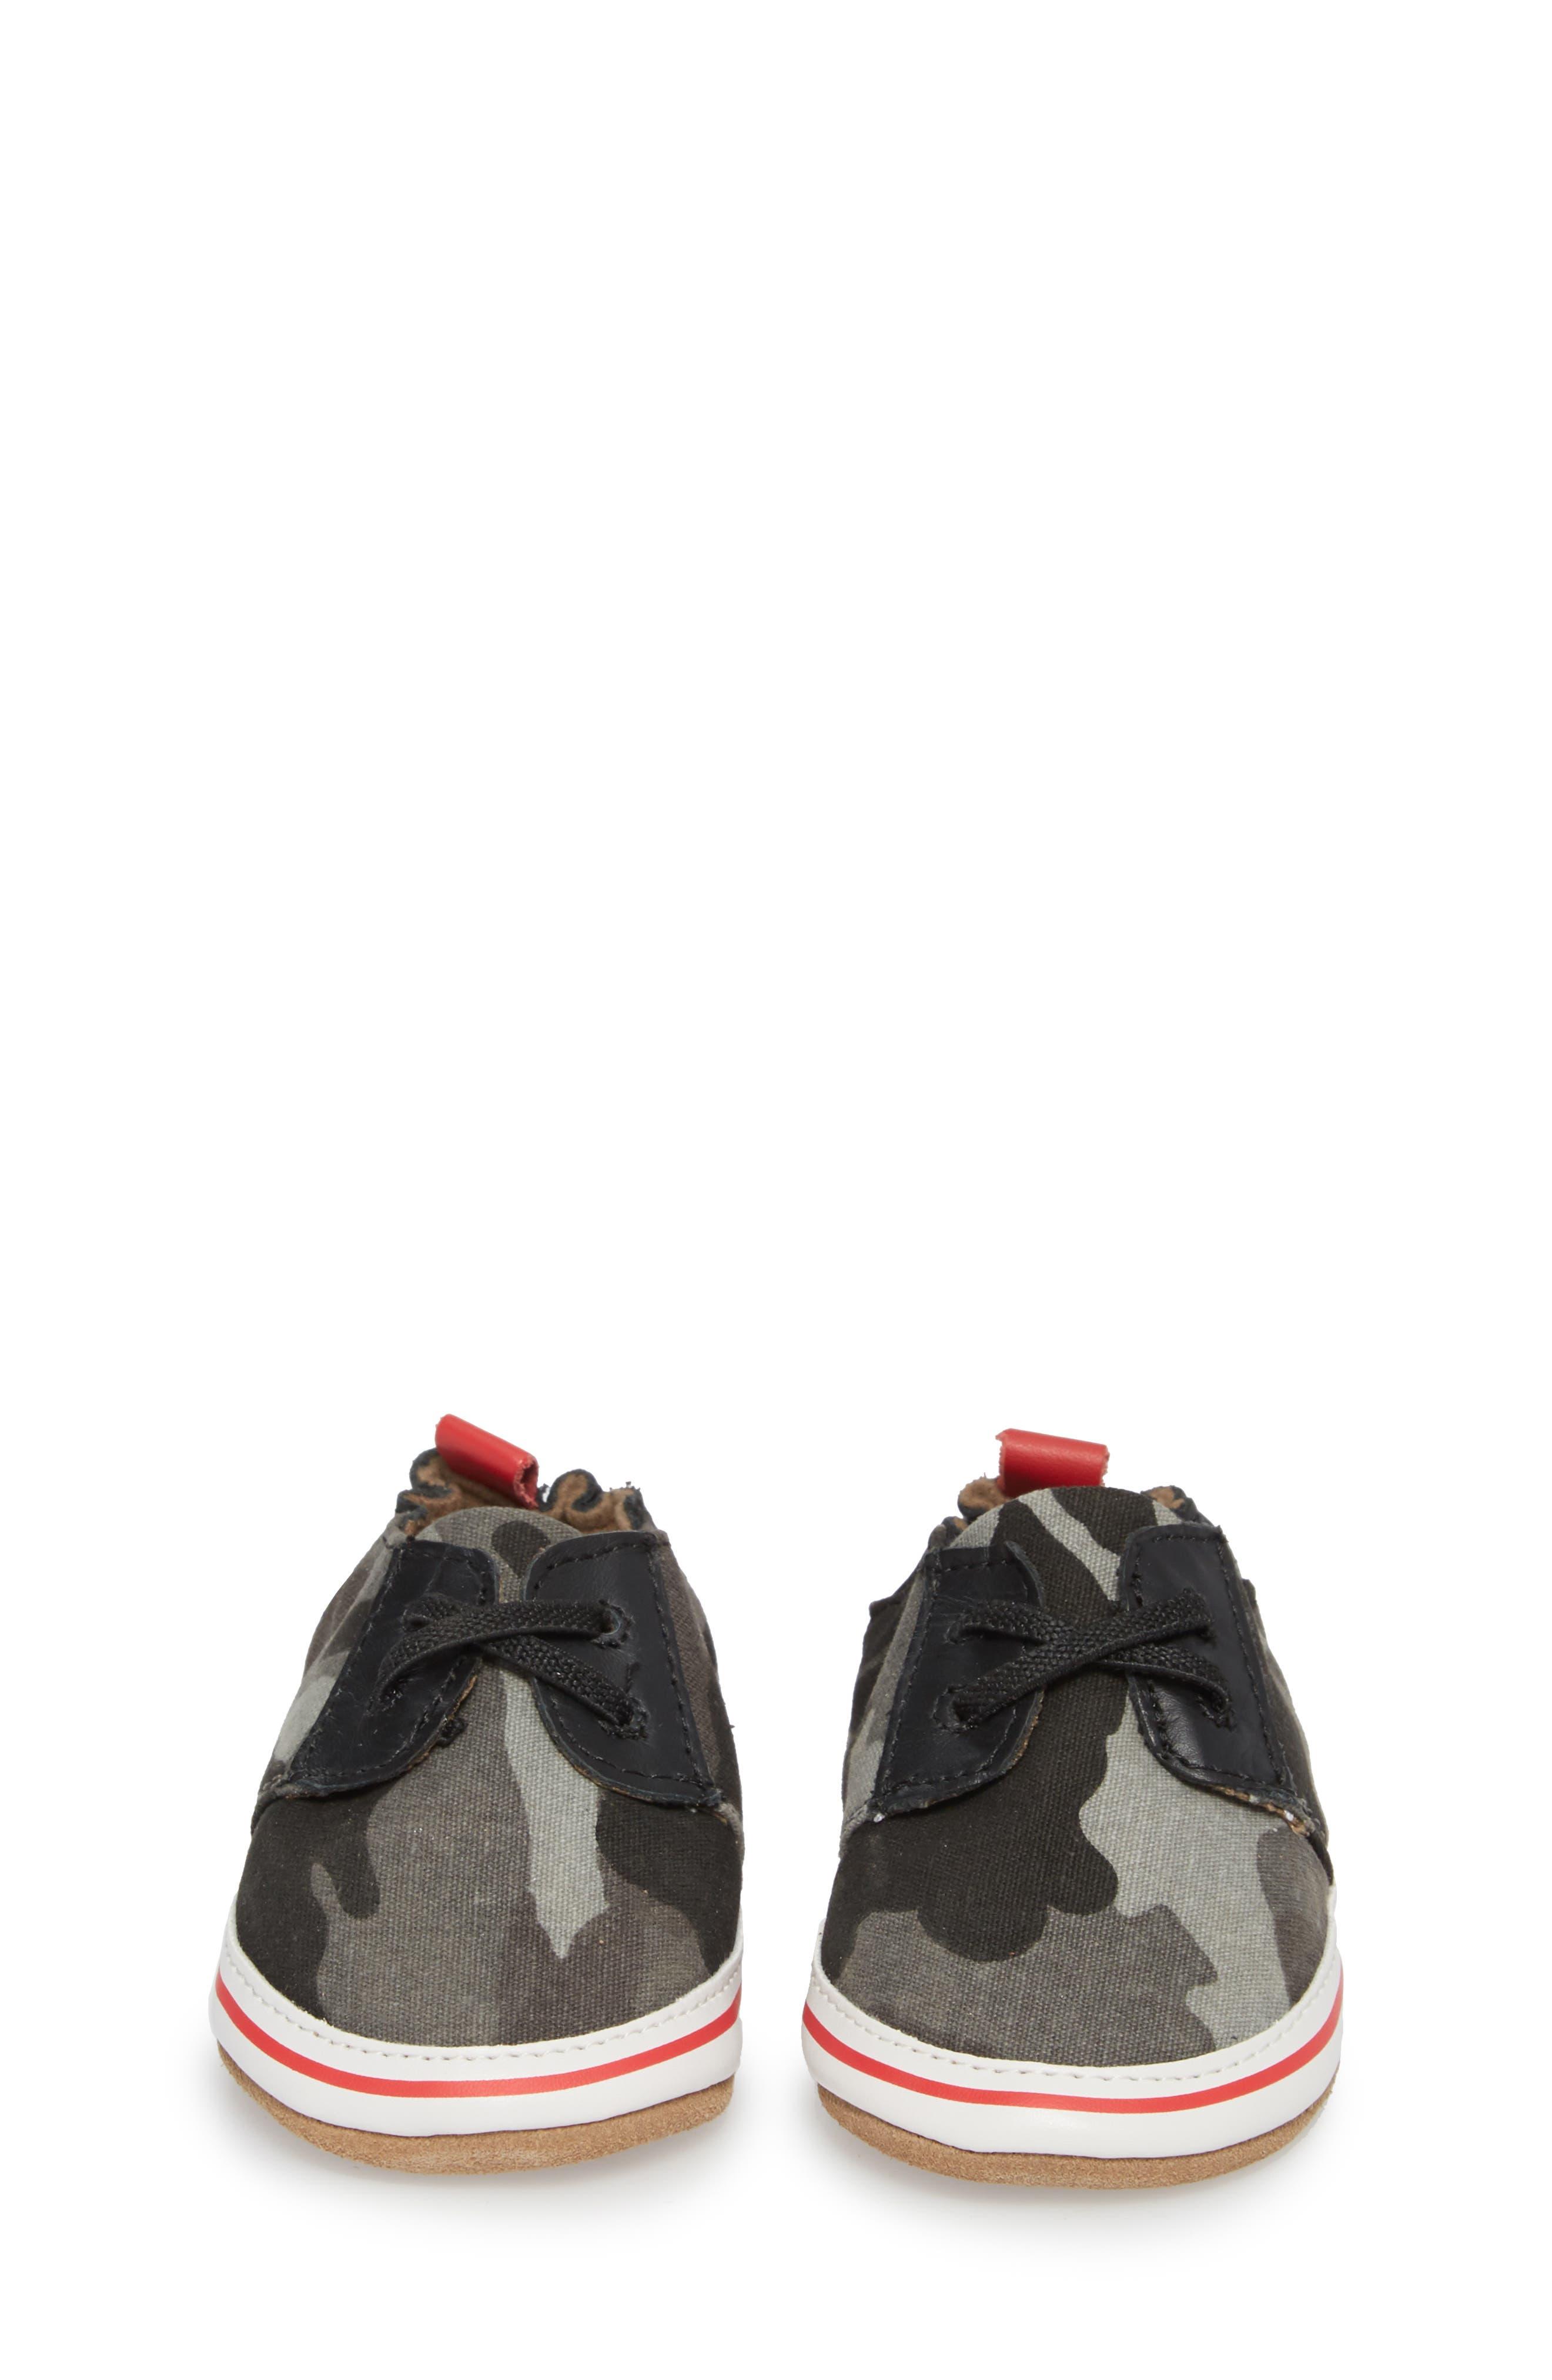 Cool & Casual Camo Print Crib Shoe,                             Alternate thumbnail 4, color,                             Grey